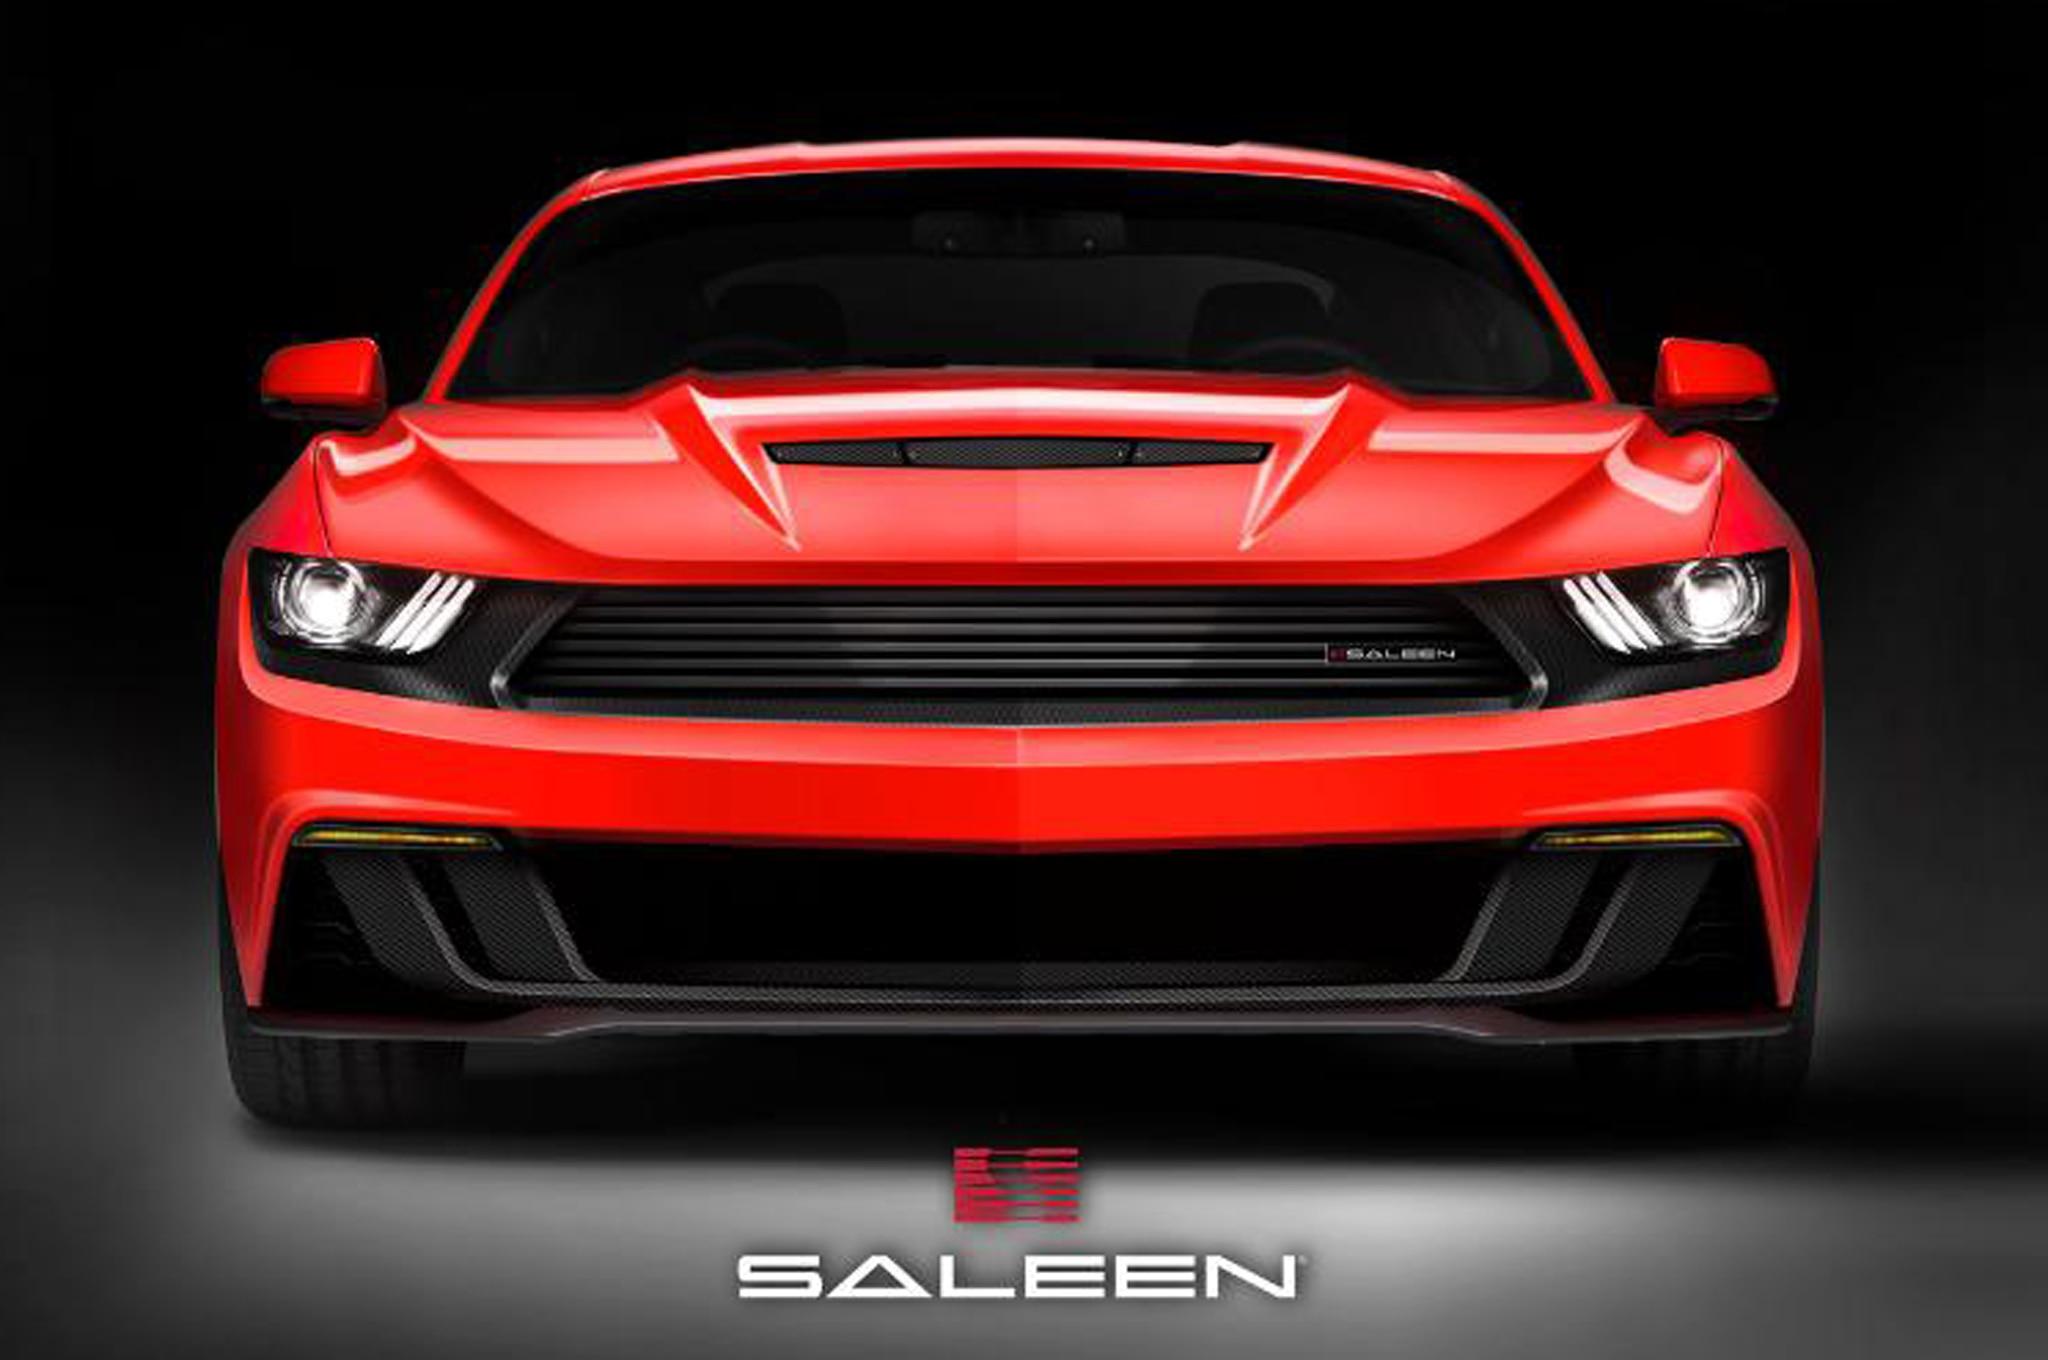 2015 Ford Mustang Saleen 302 Teaser